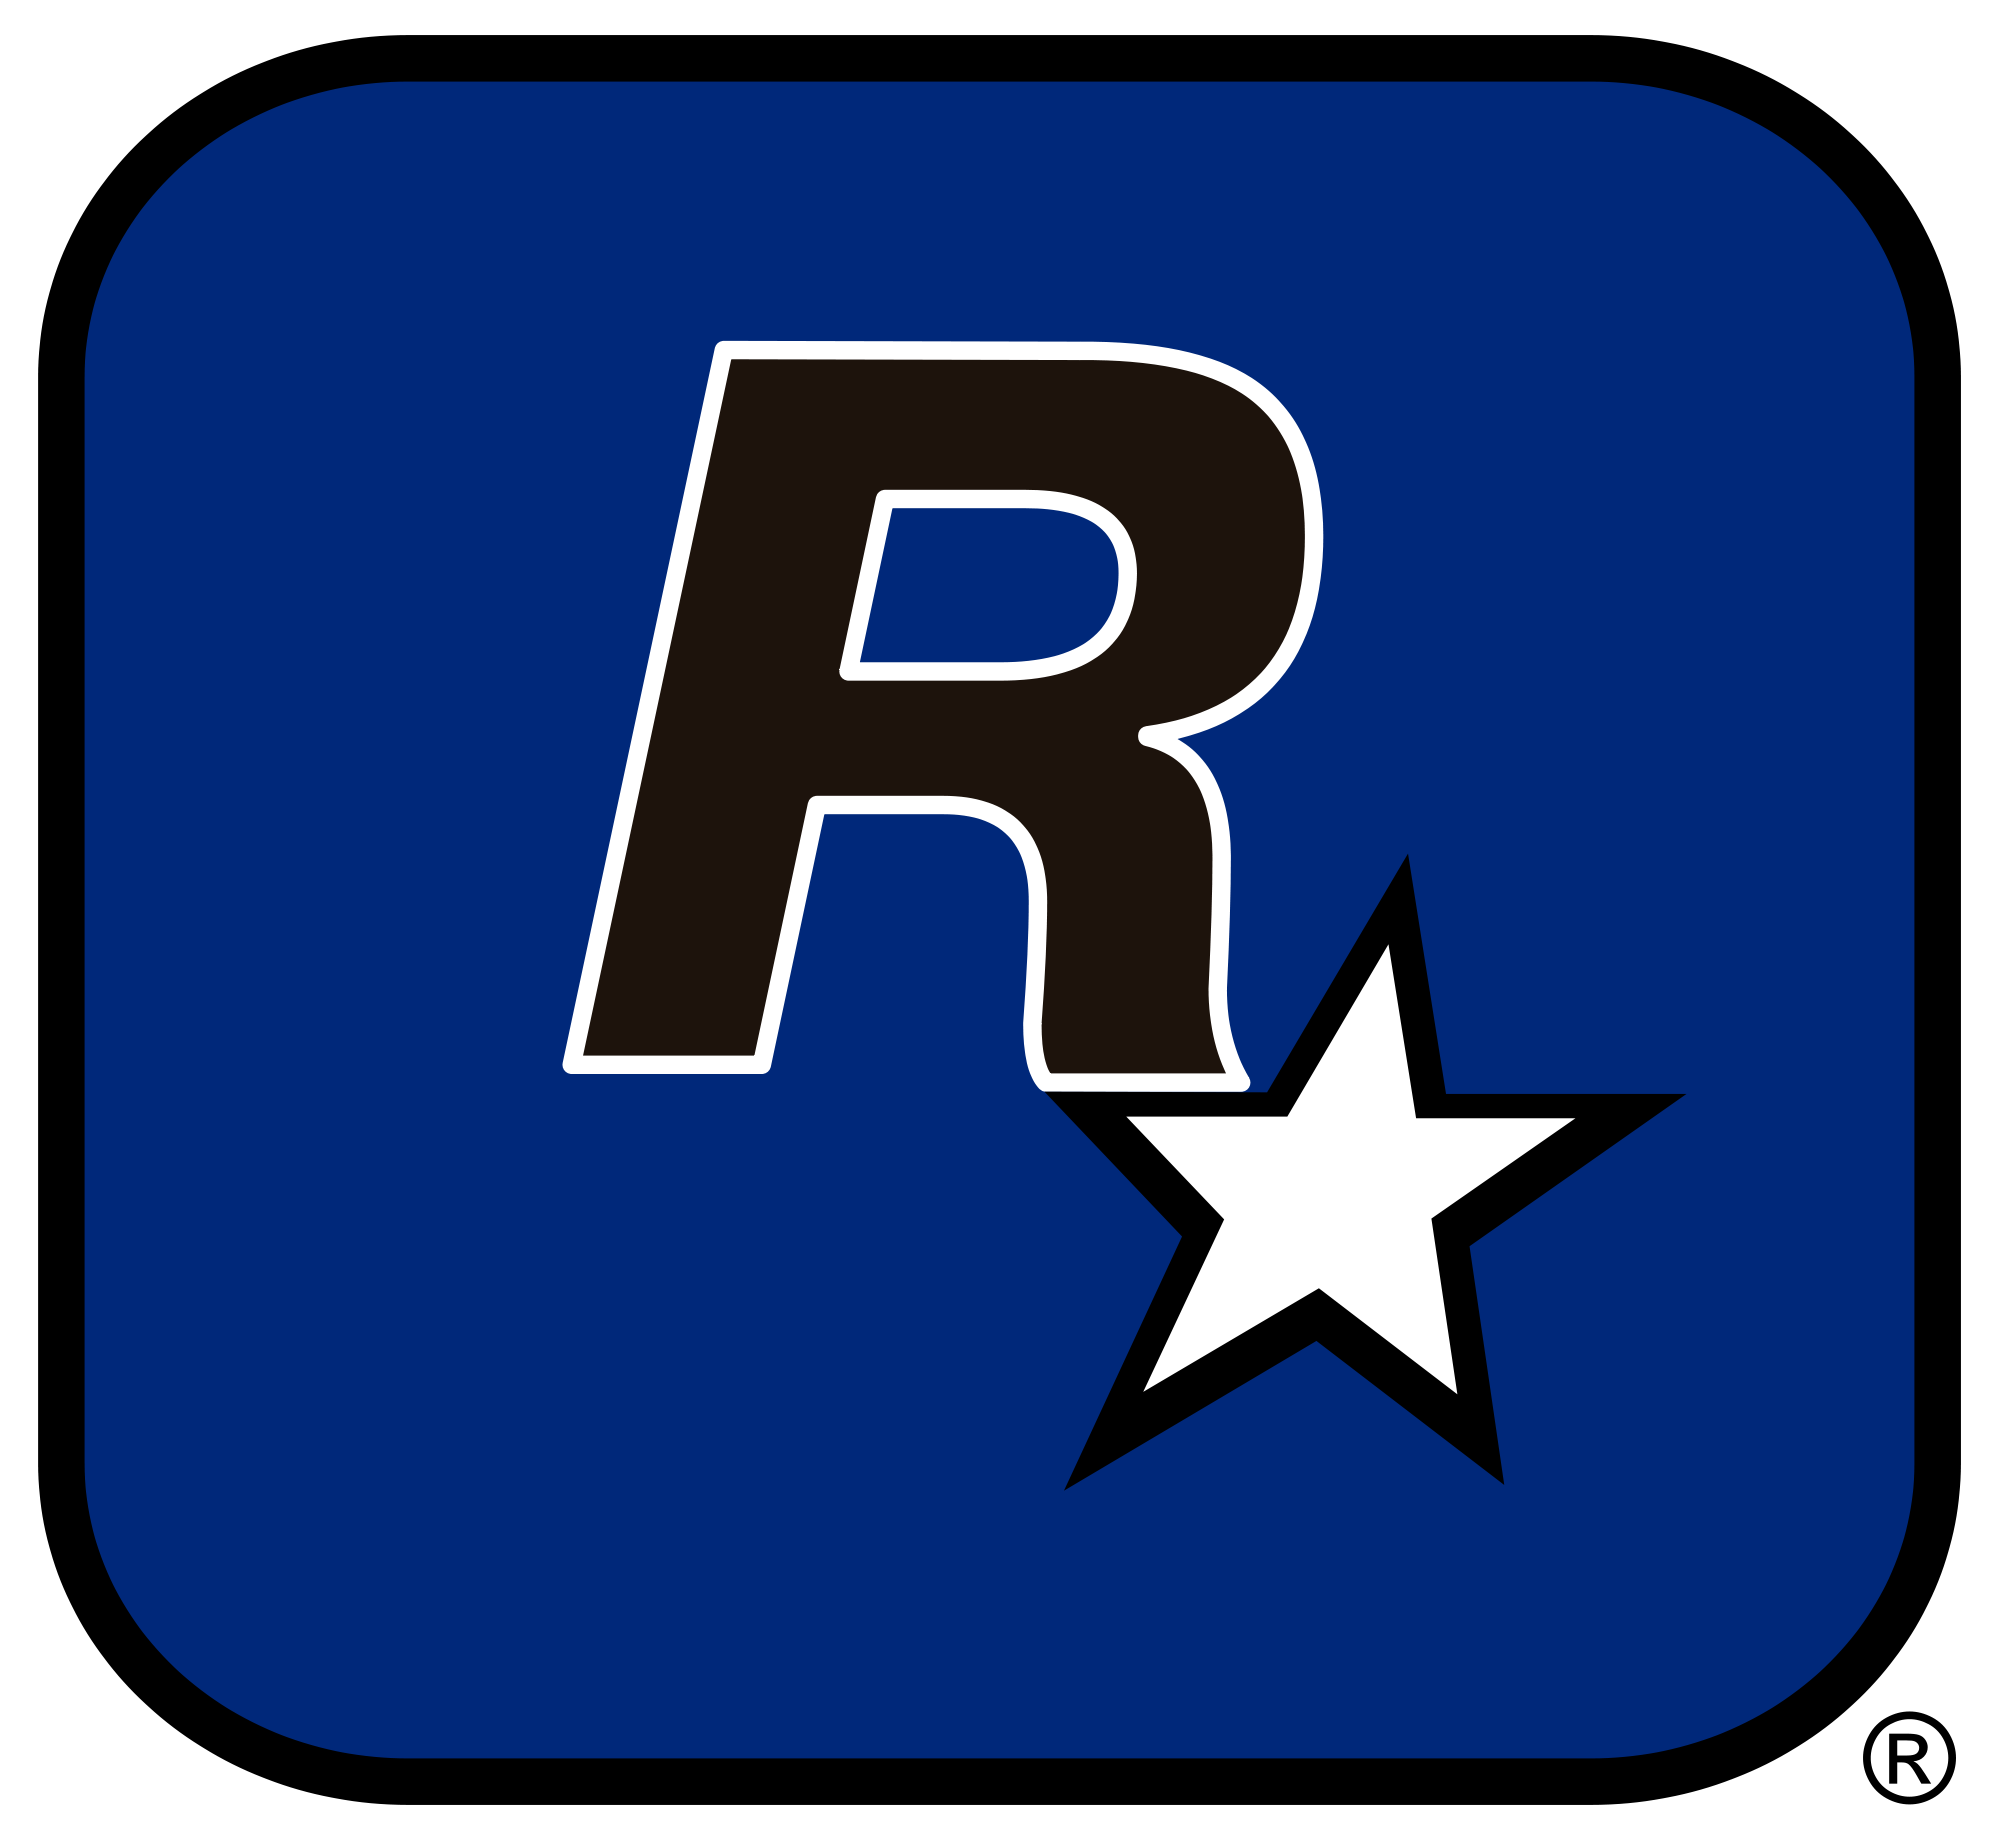 Rockstar Games Rockstar Games Logo Rockstar Games Rockstar Games Gta